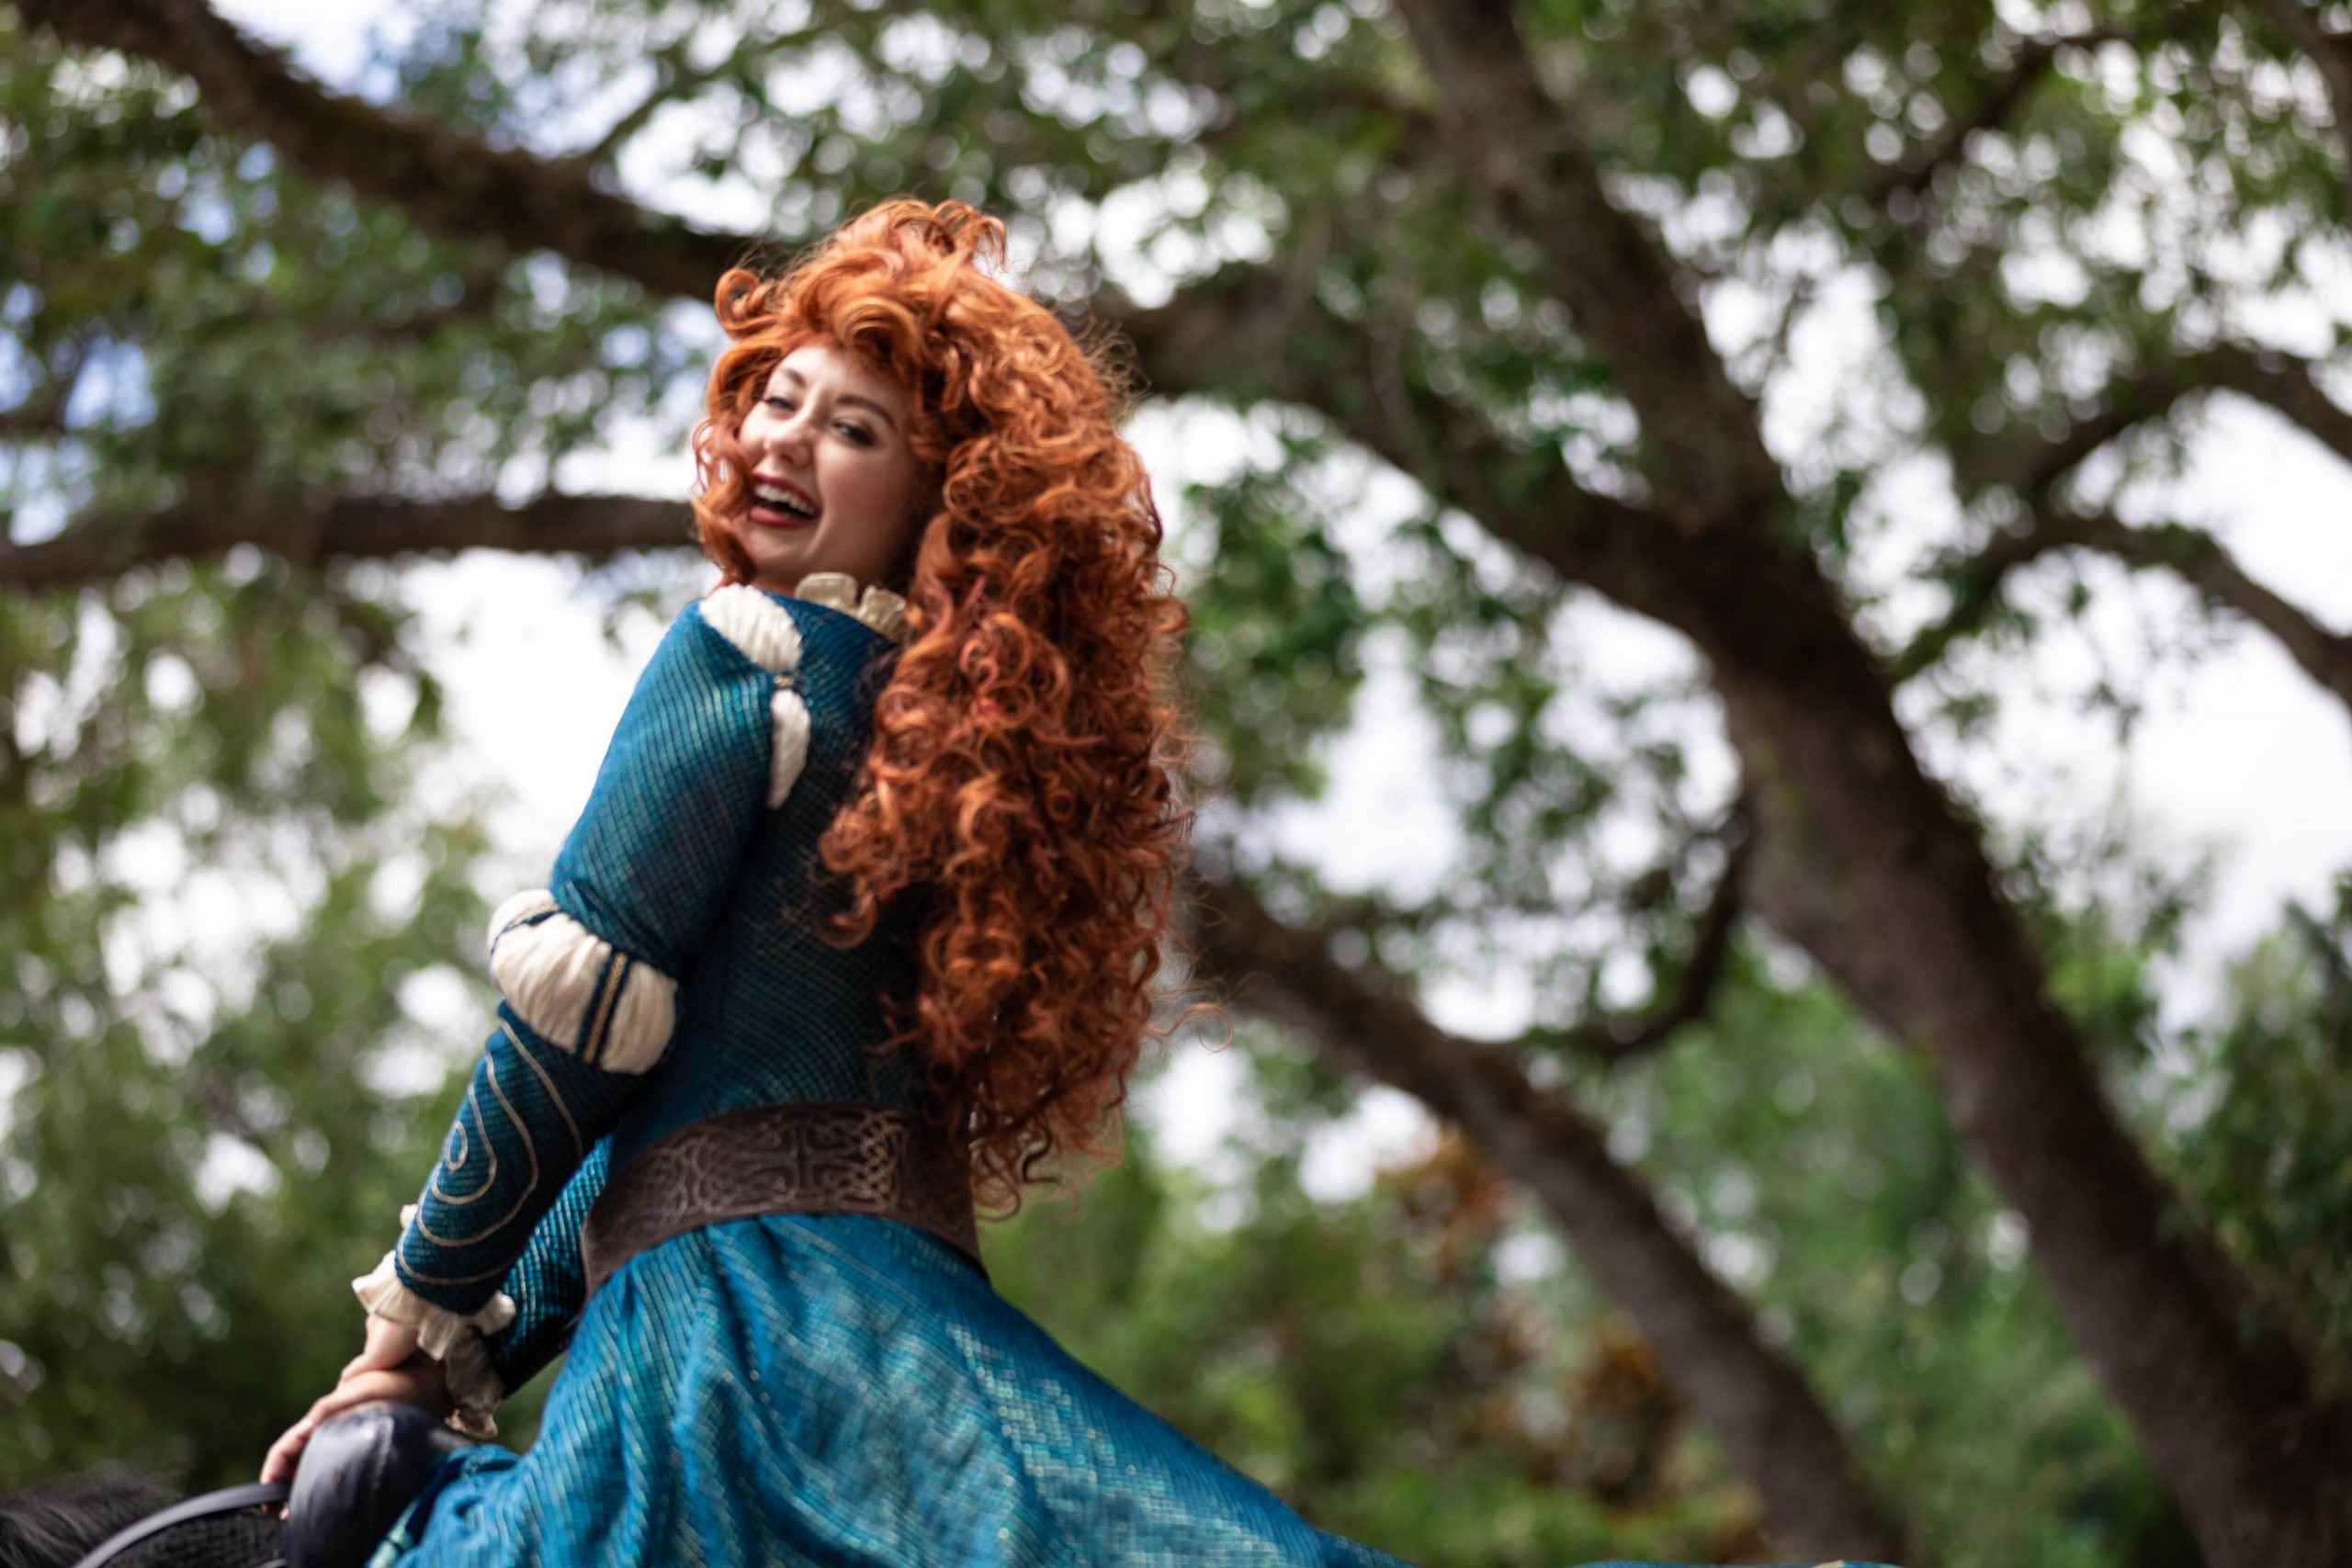 Photograph of Disney Princess Merida at Walt Disney World Photographed by Luxury Travel Writer Annie Fairfax